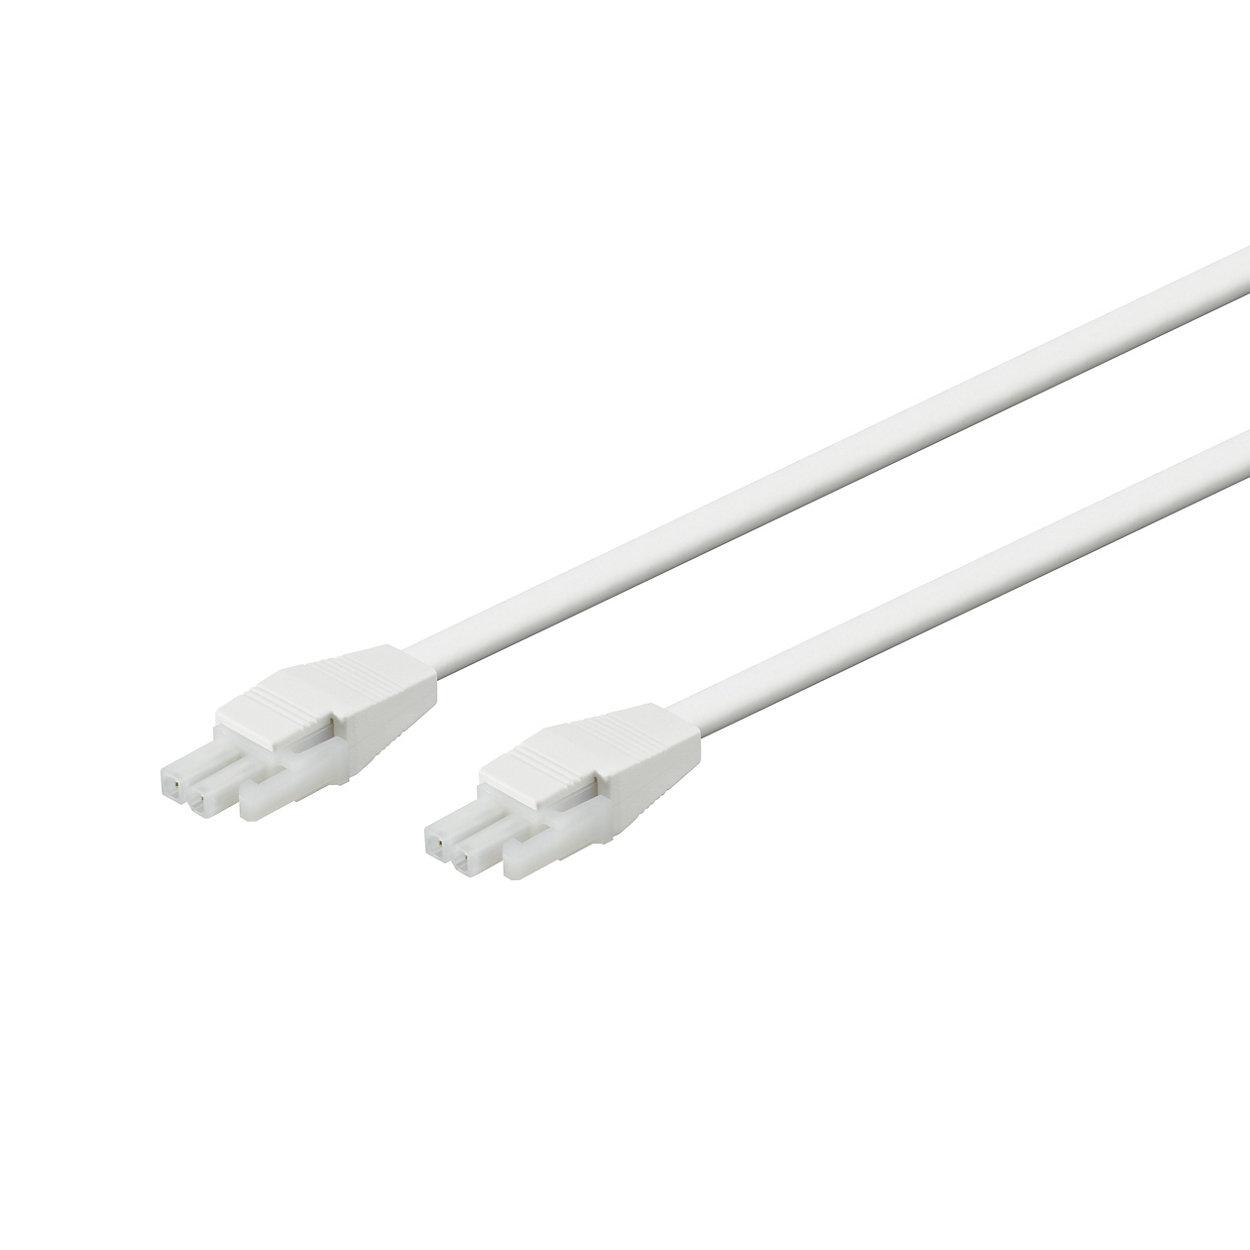 Vaya Cove – compact and economical LED fixture